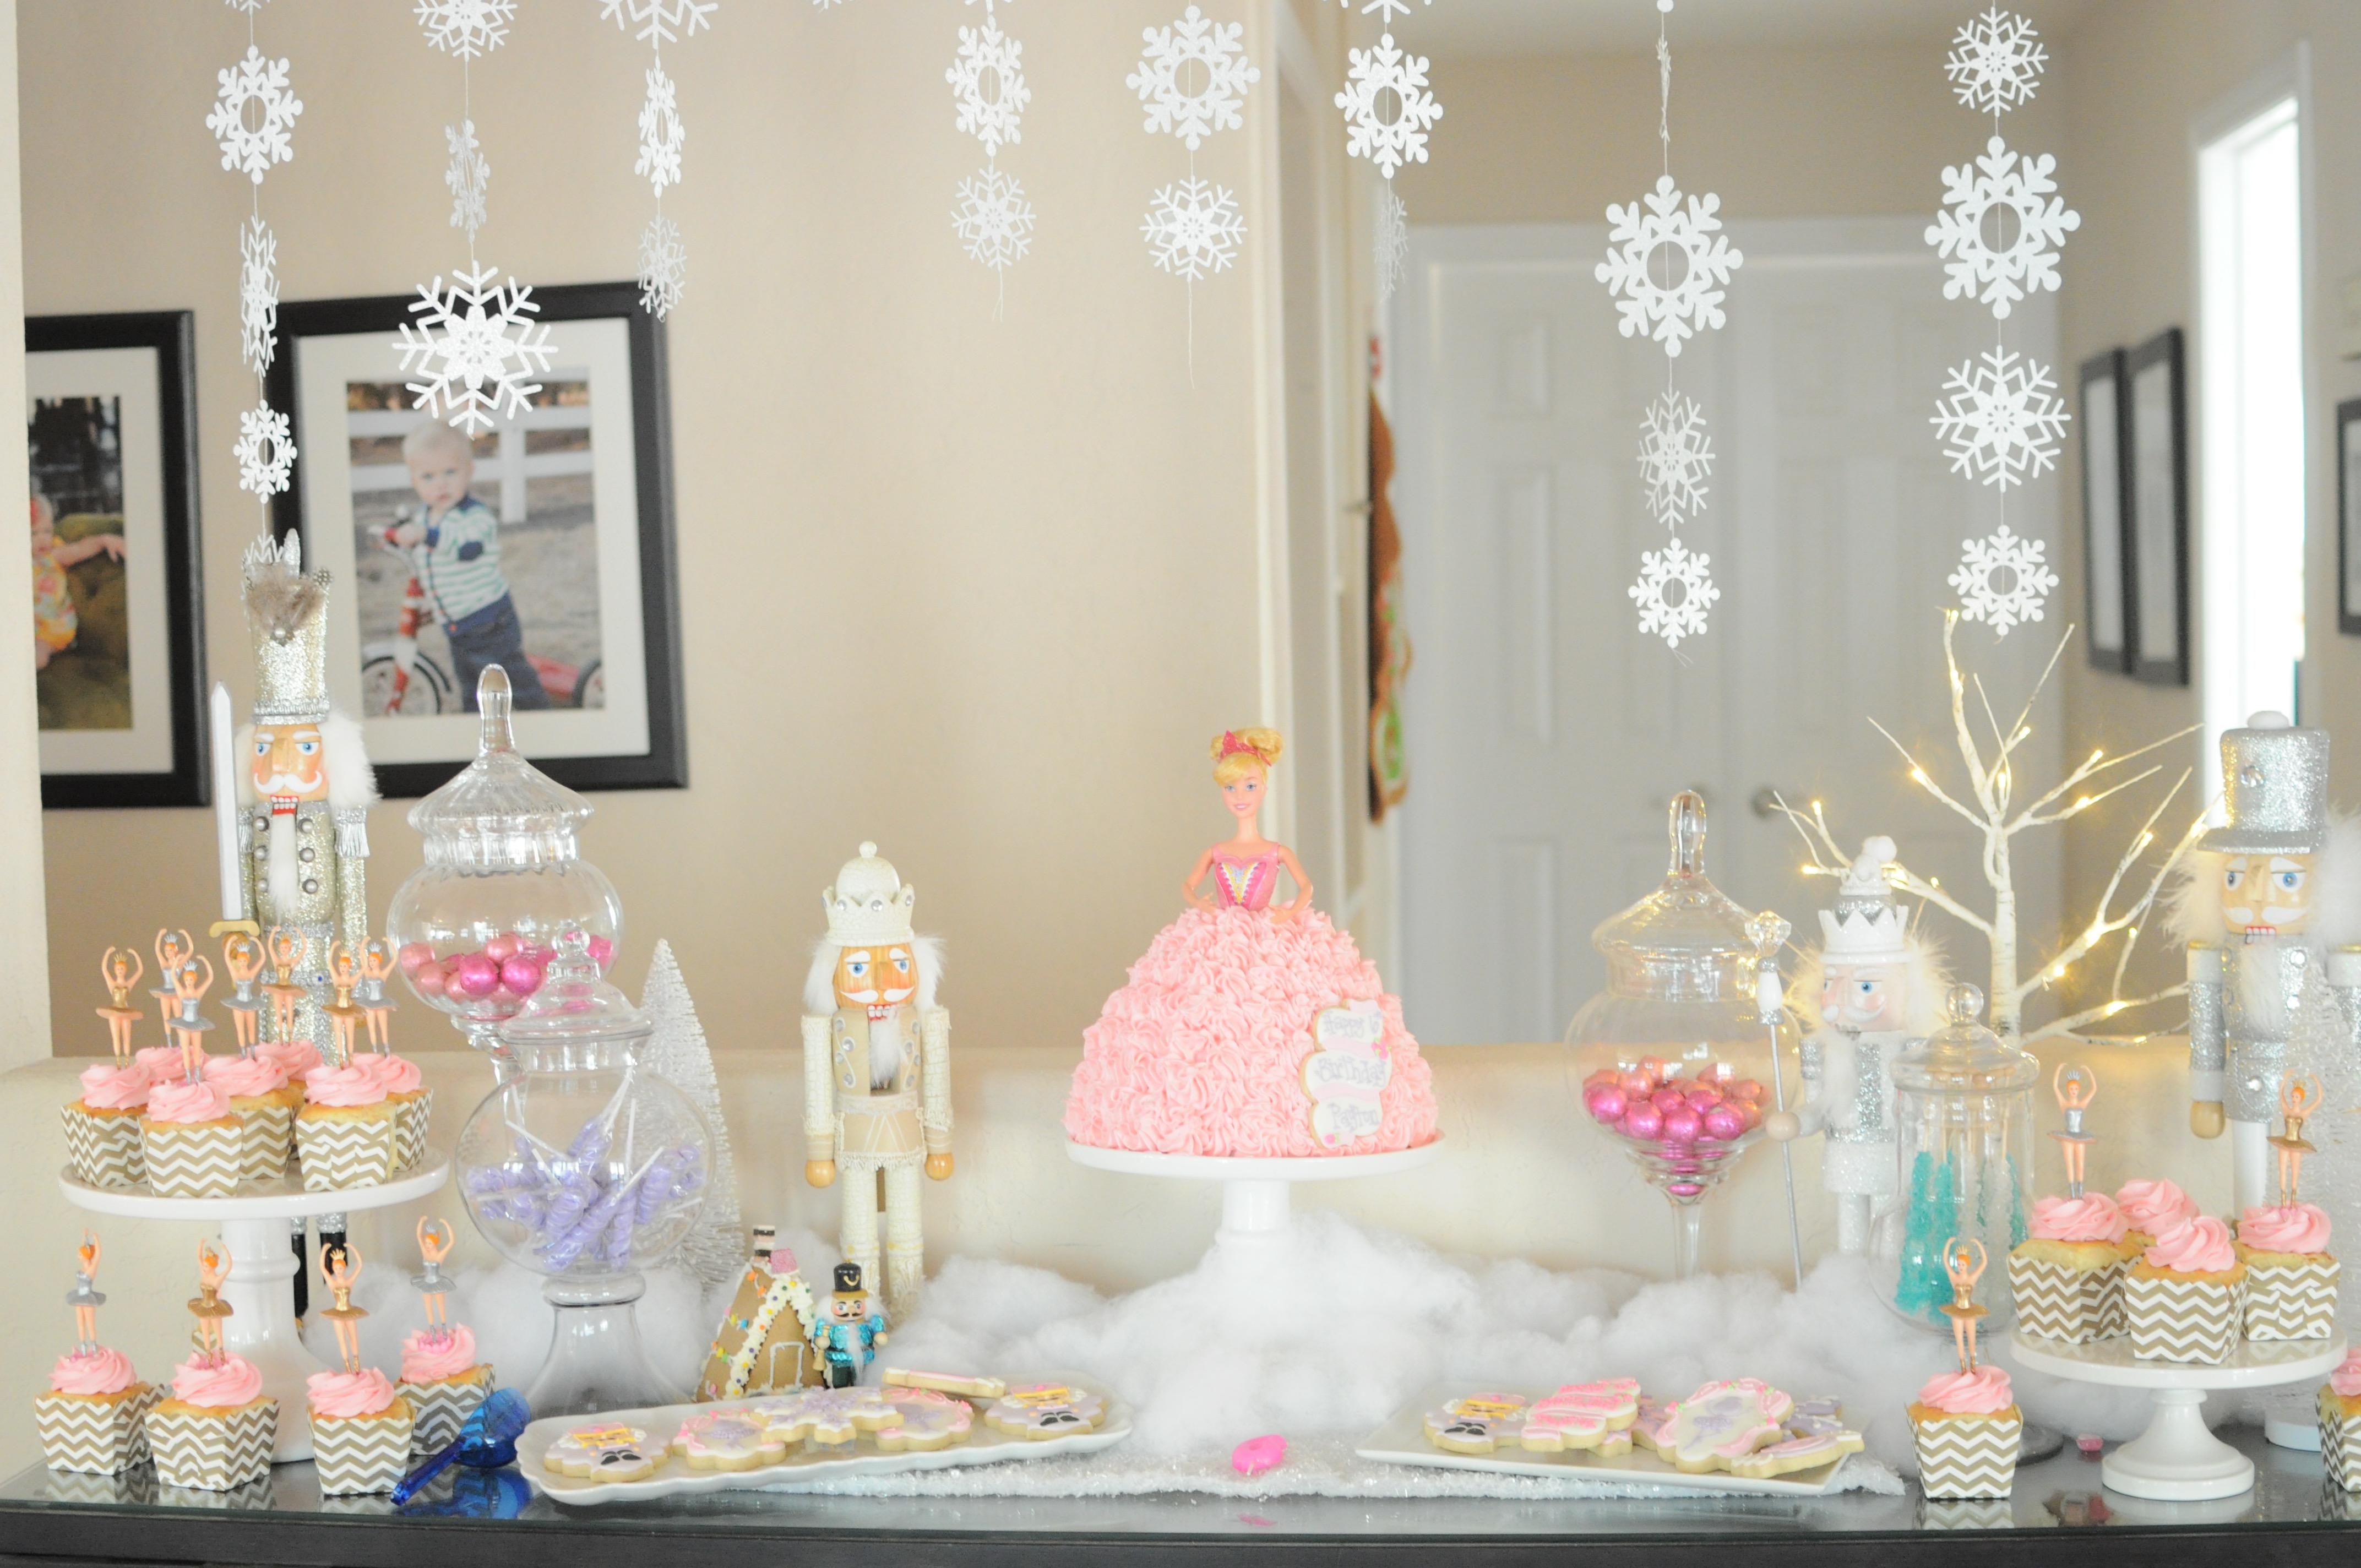 A Nutcracker, Sugarplum Fairy Celebration